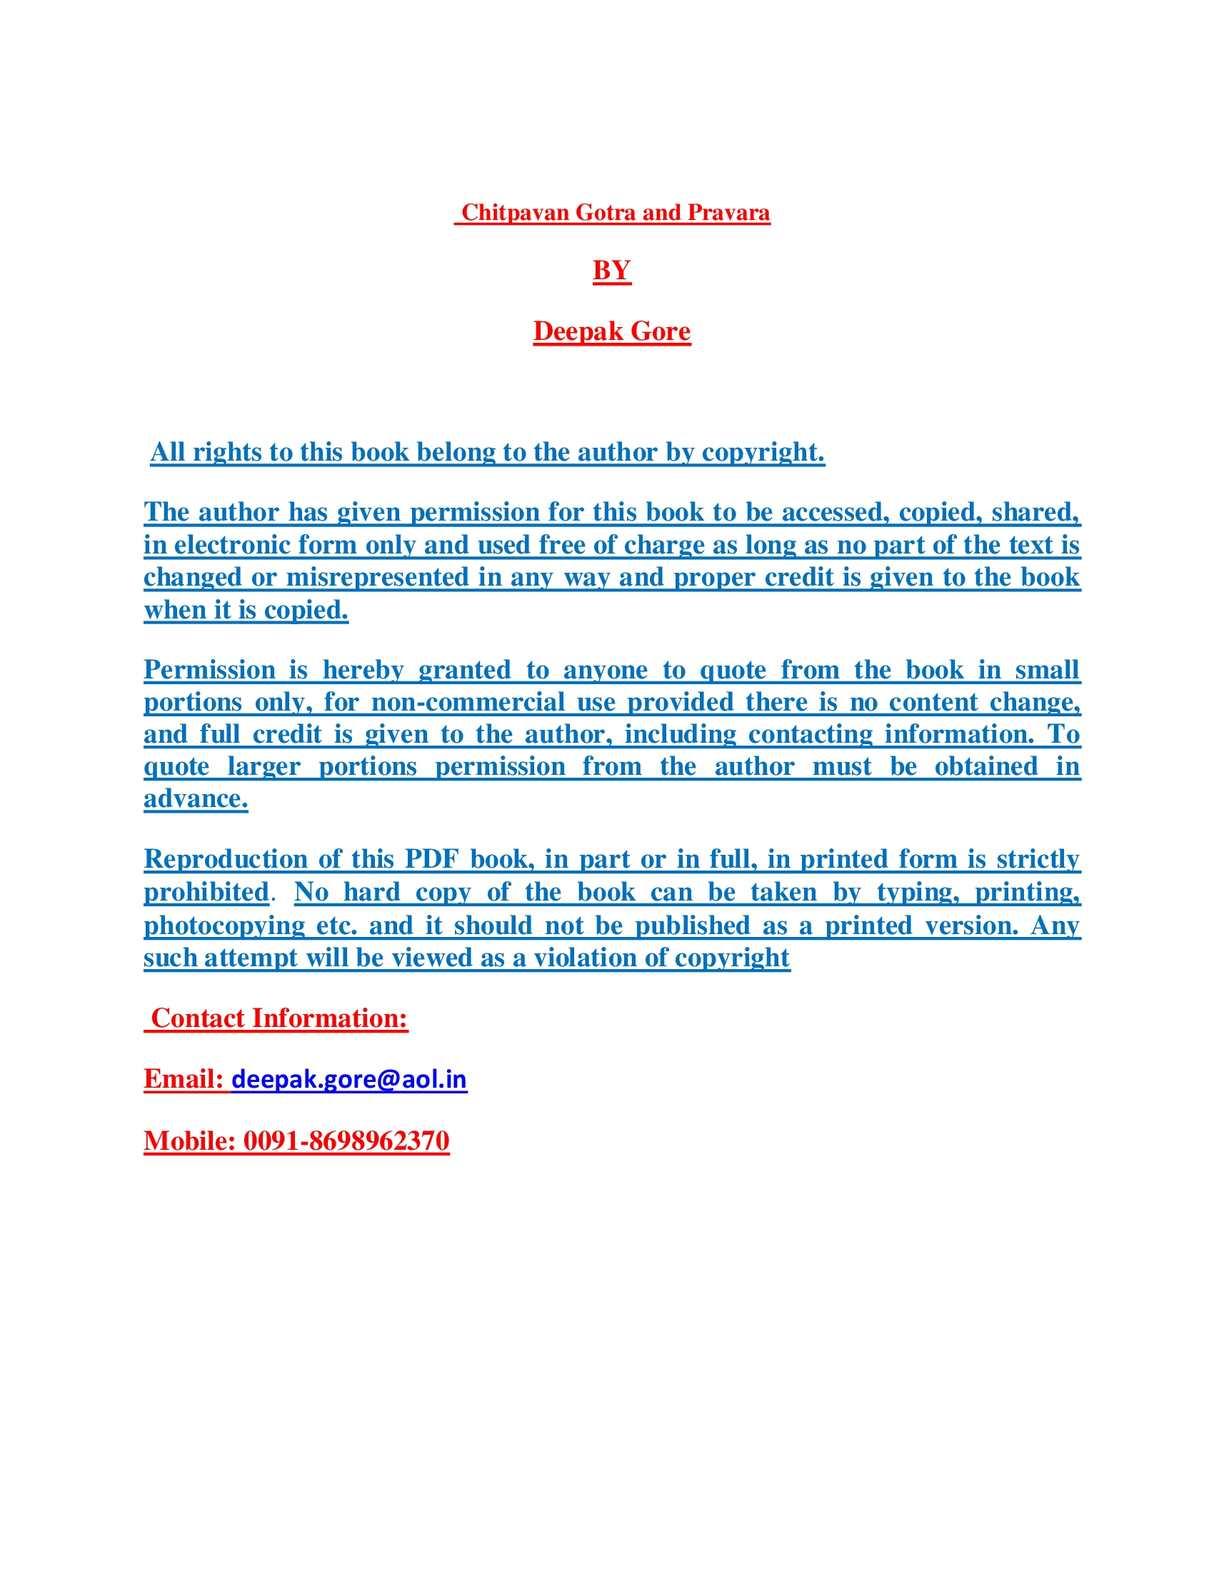 Calaméo - Chitpavan-Gotra-Pravara 1 3-secured